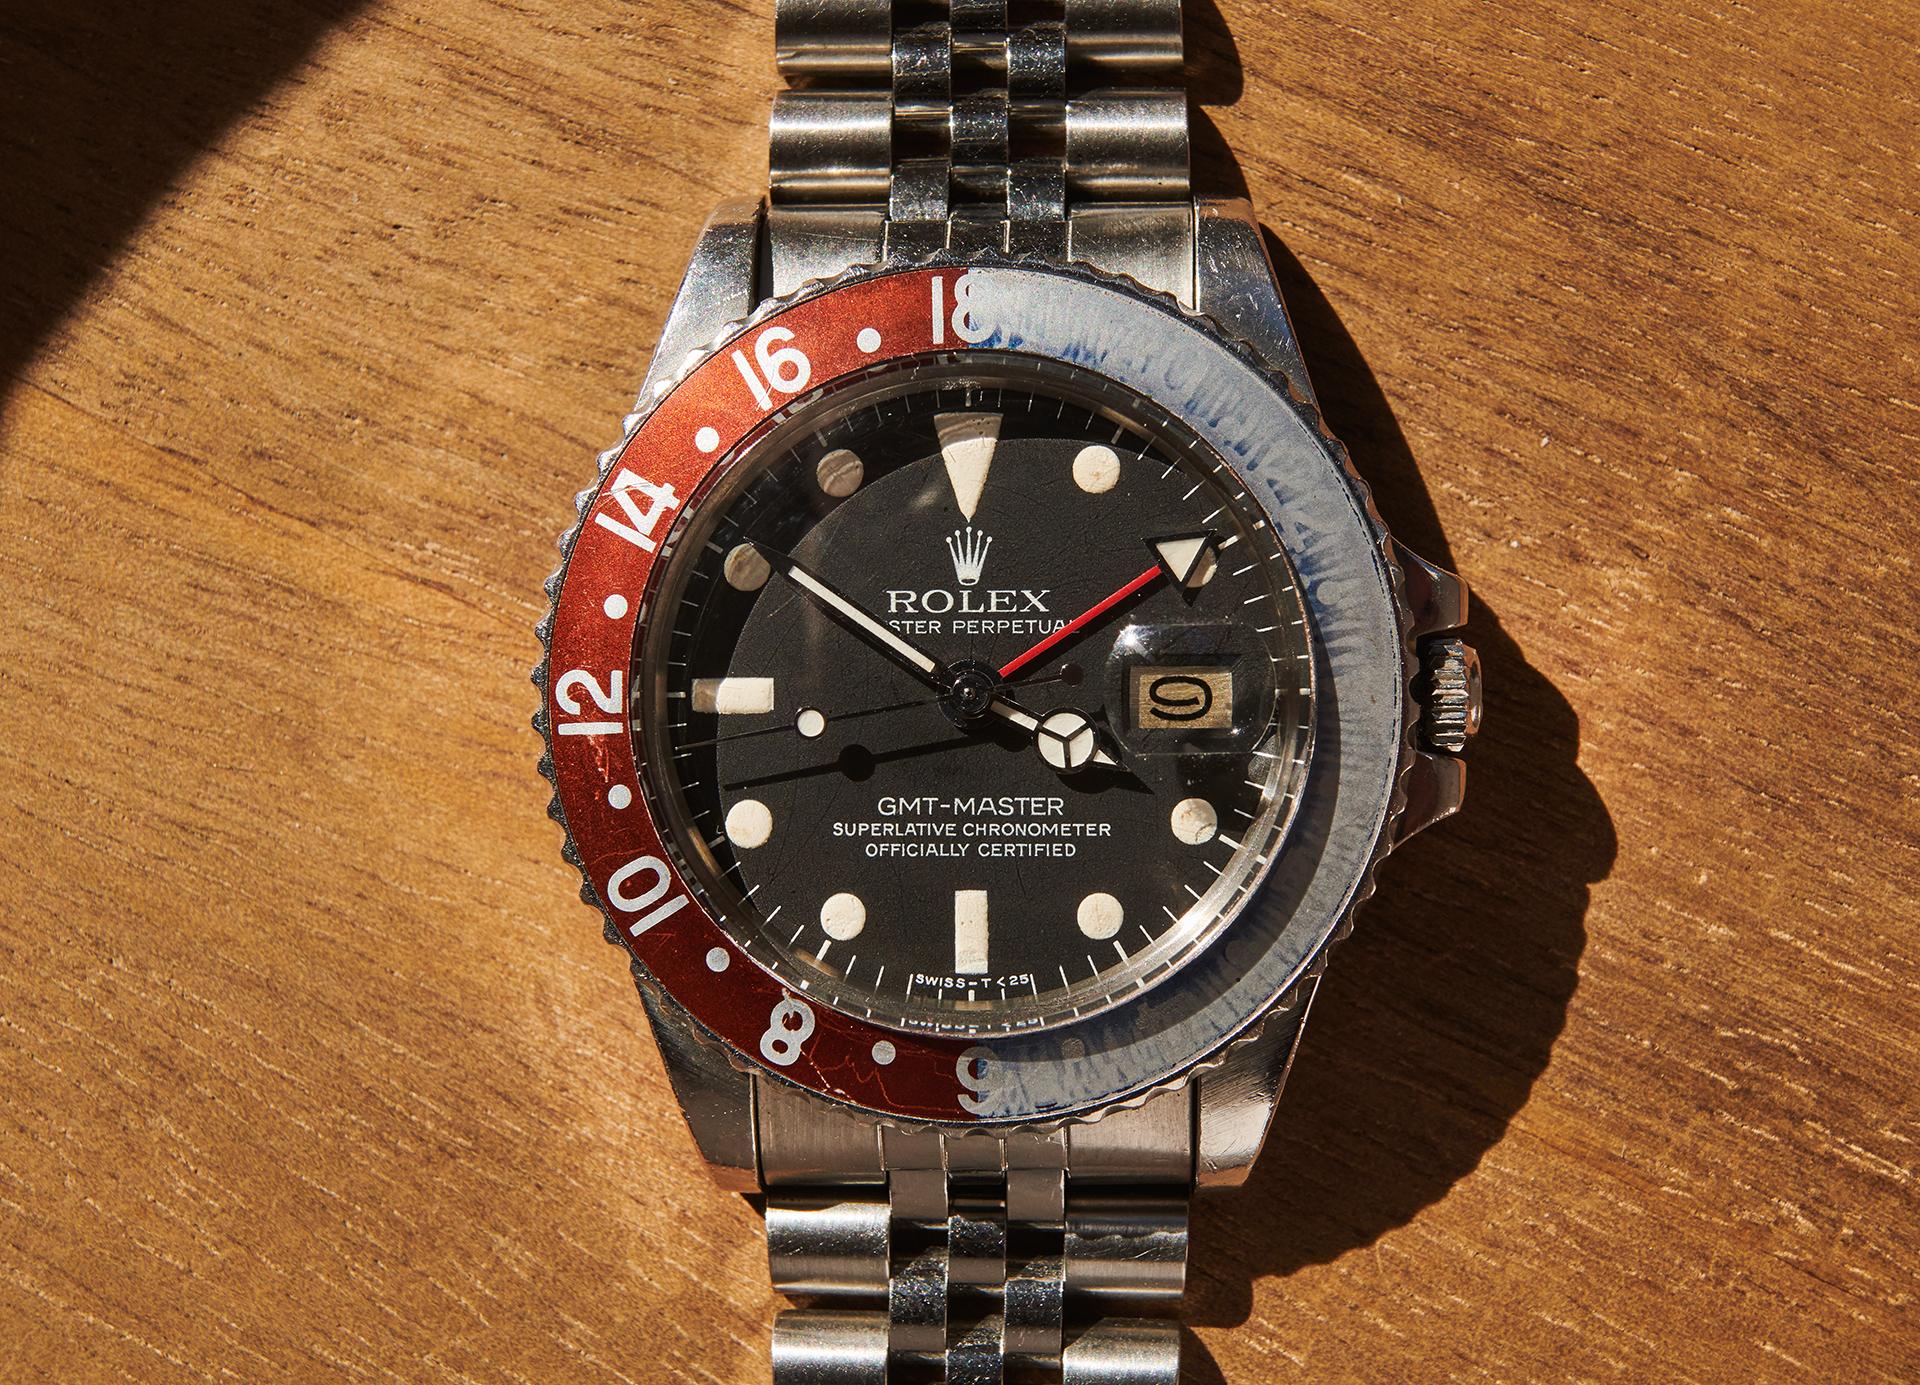 Rolex 1675 GMT Master / Maxi Dial